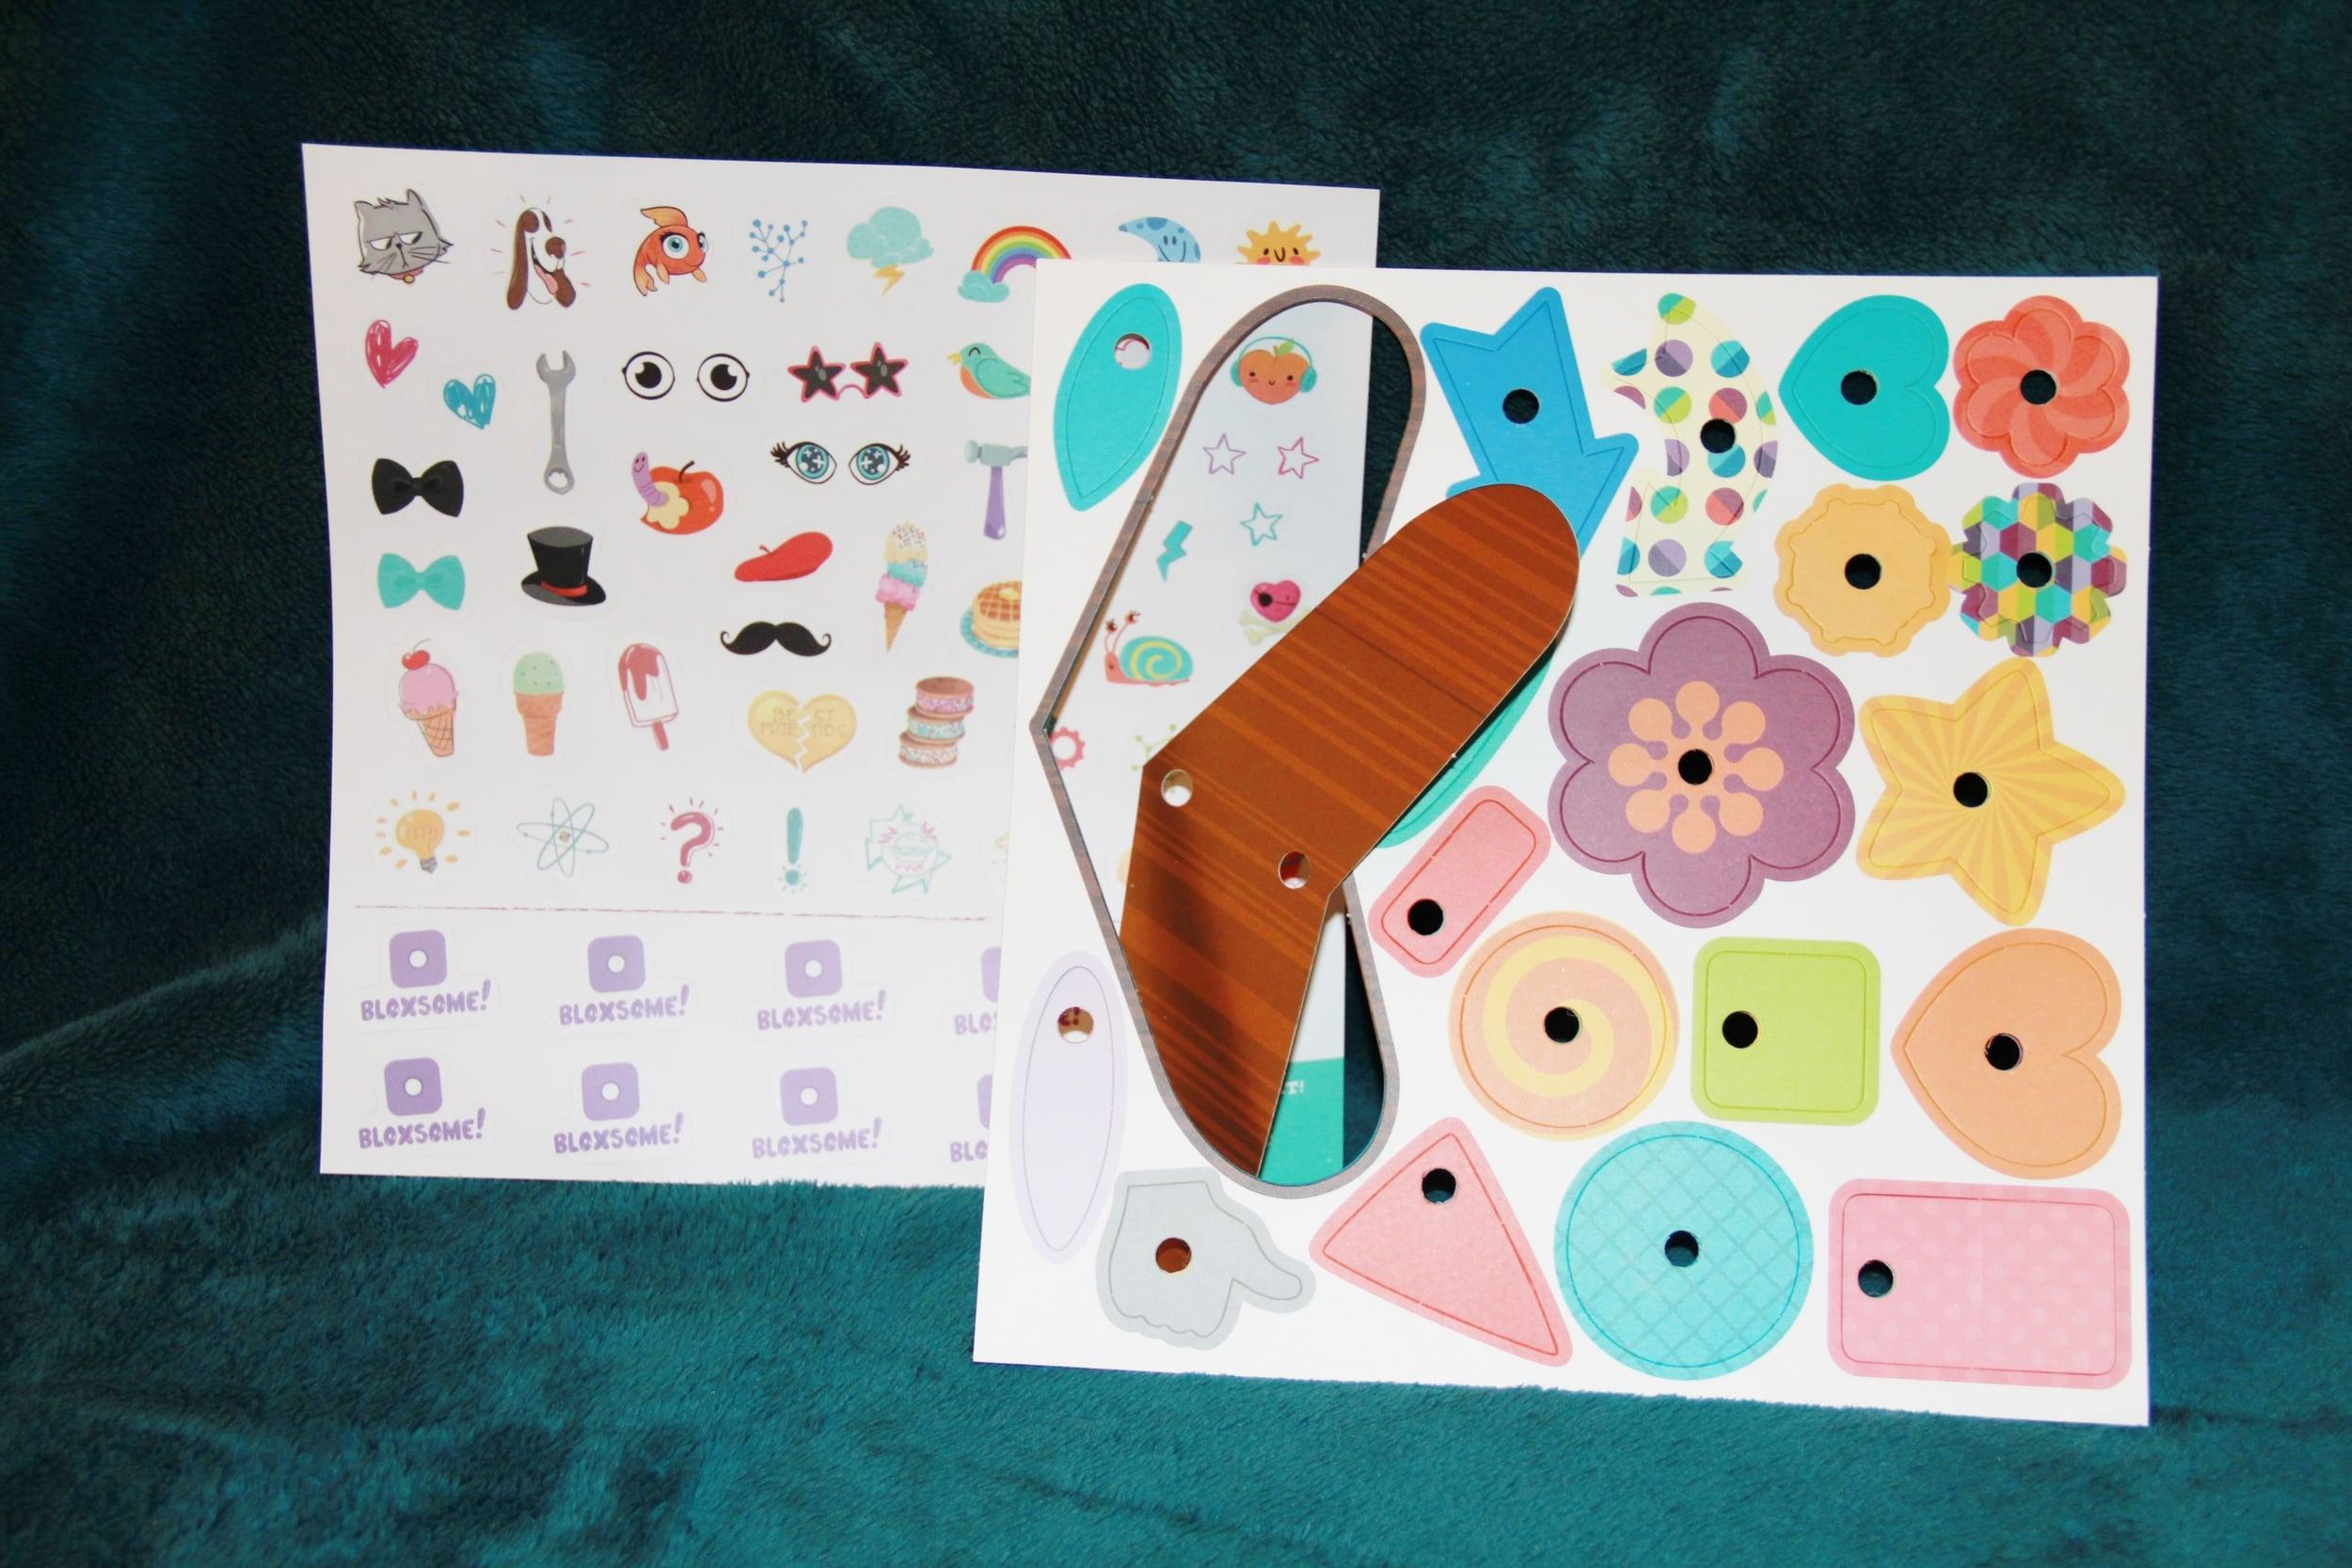 GoldieBlox stickers and craftstruction pieces